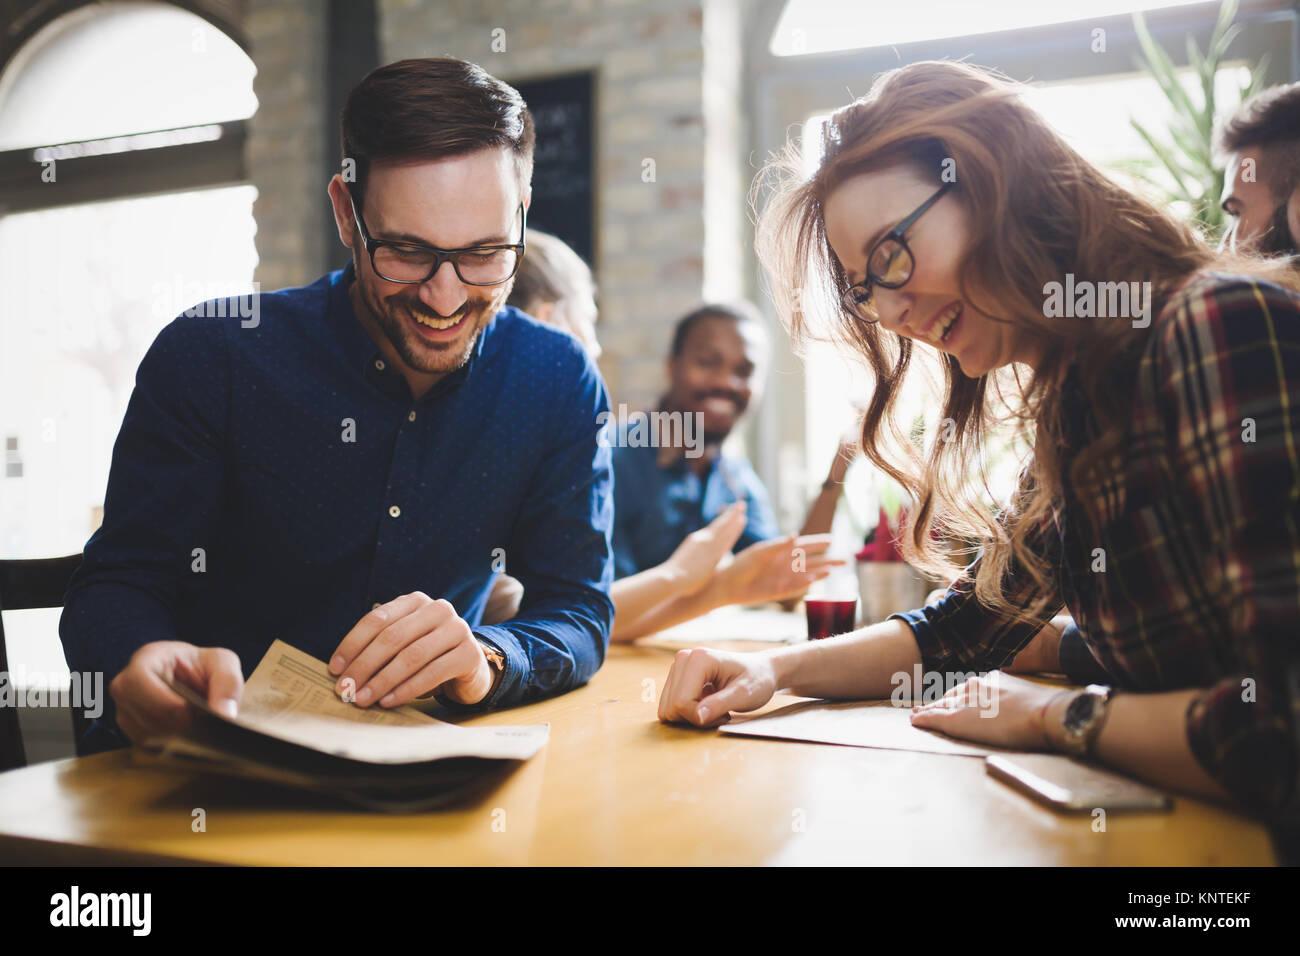 Flirt collègues manger dehors et dating in restaurant Photo Stock